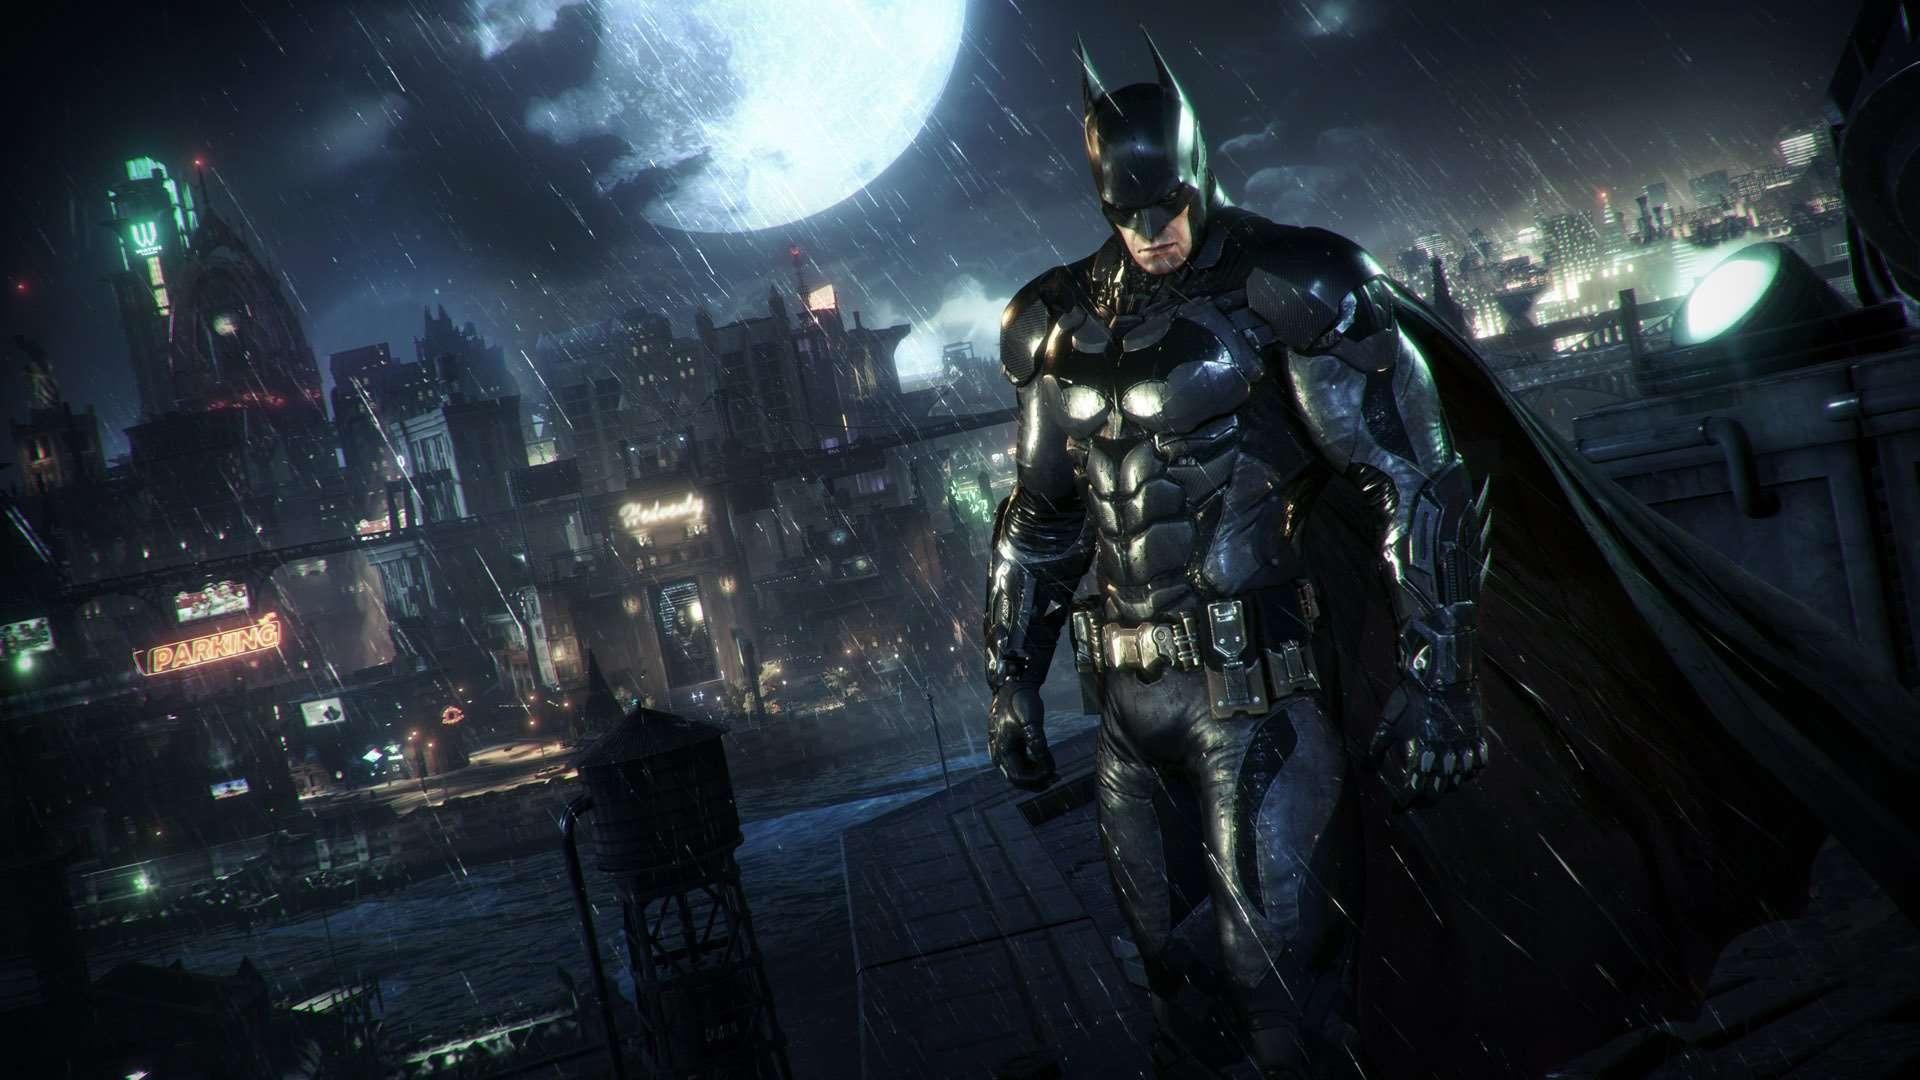 Foto: Warner Bros. Interactive Entertainment